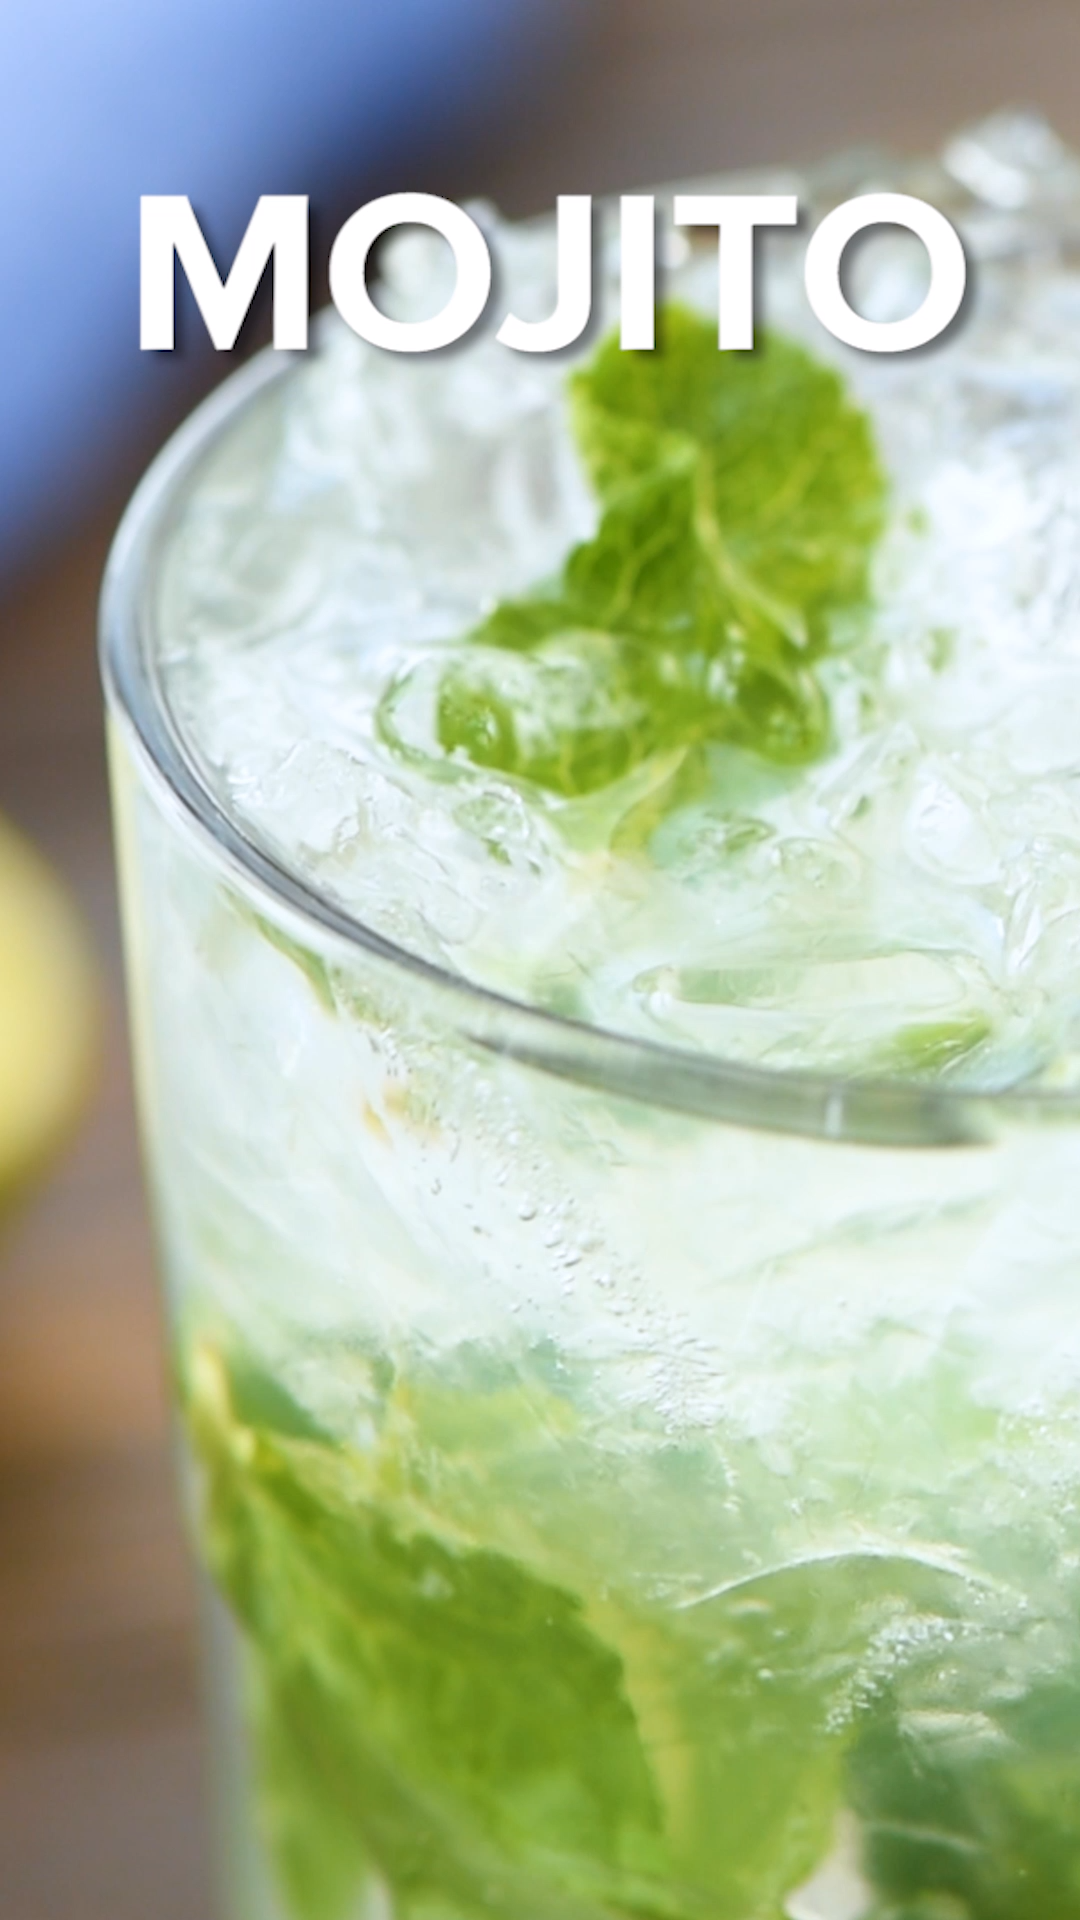 Mojito Alcohol Drink Recipes Drinks Alcohol Recipes Easy Drinks